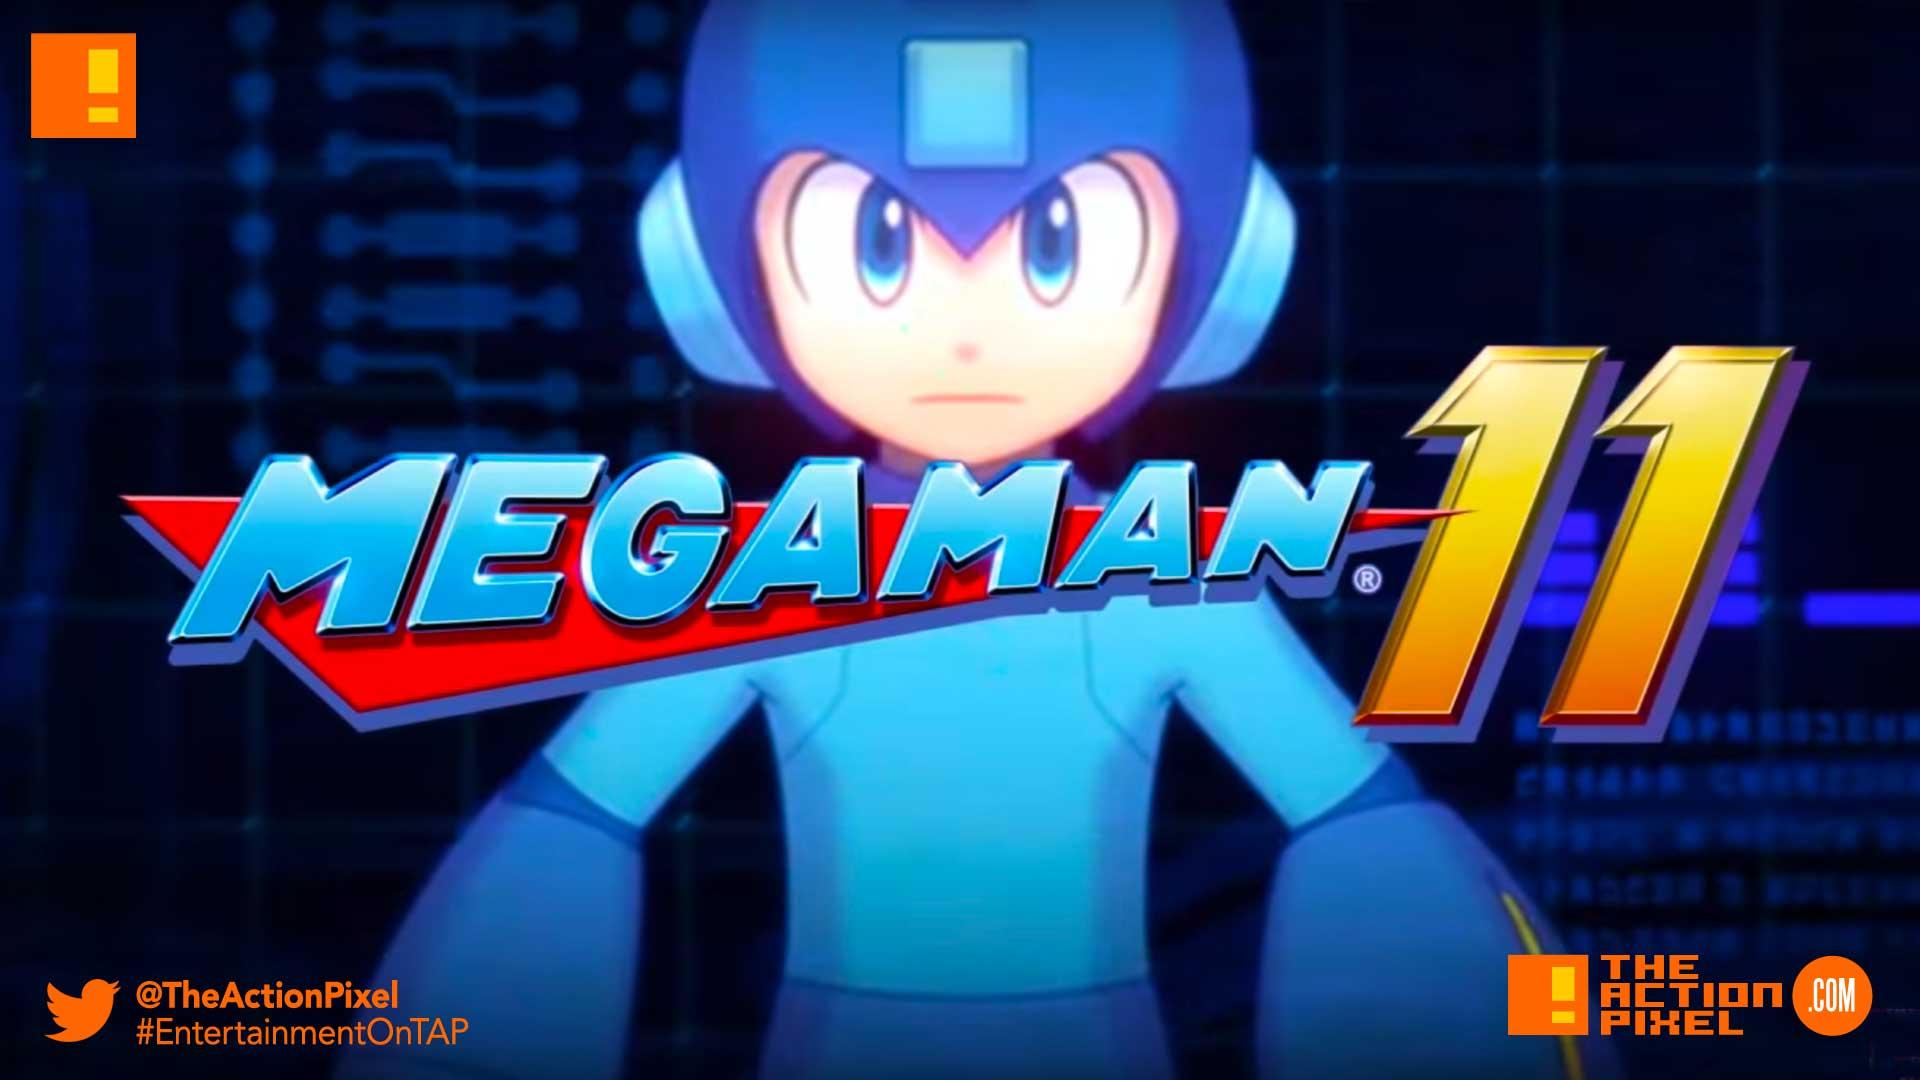 mega man 11, mega man, the action pixel, nintendo, nintendo switch, capcom ,